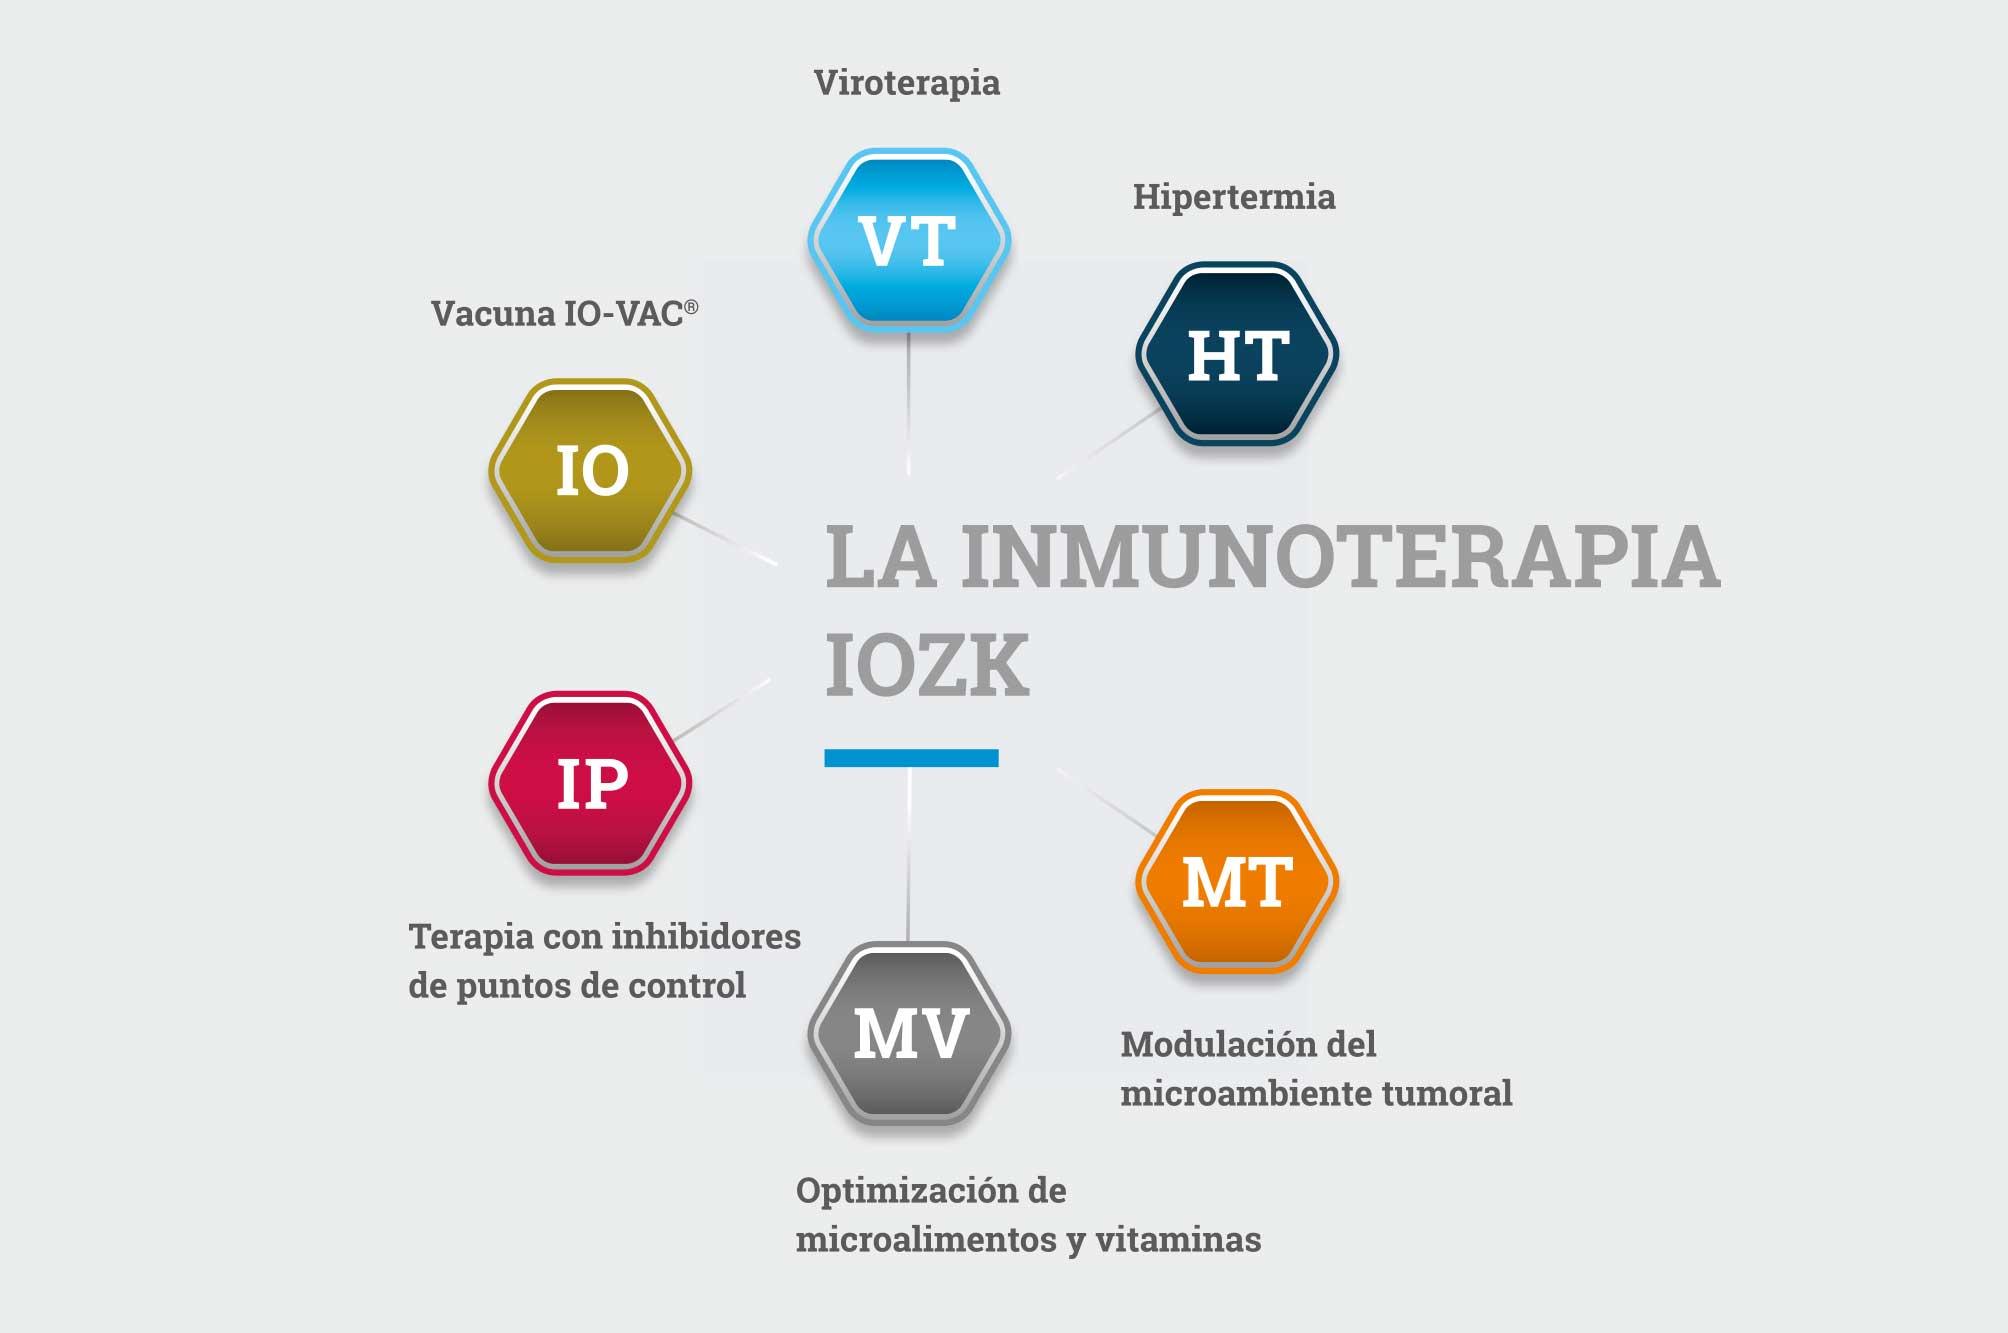 La inmunotherapia IOZK